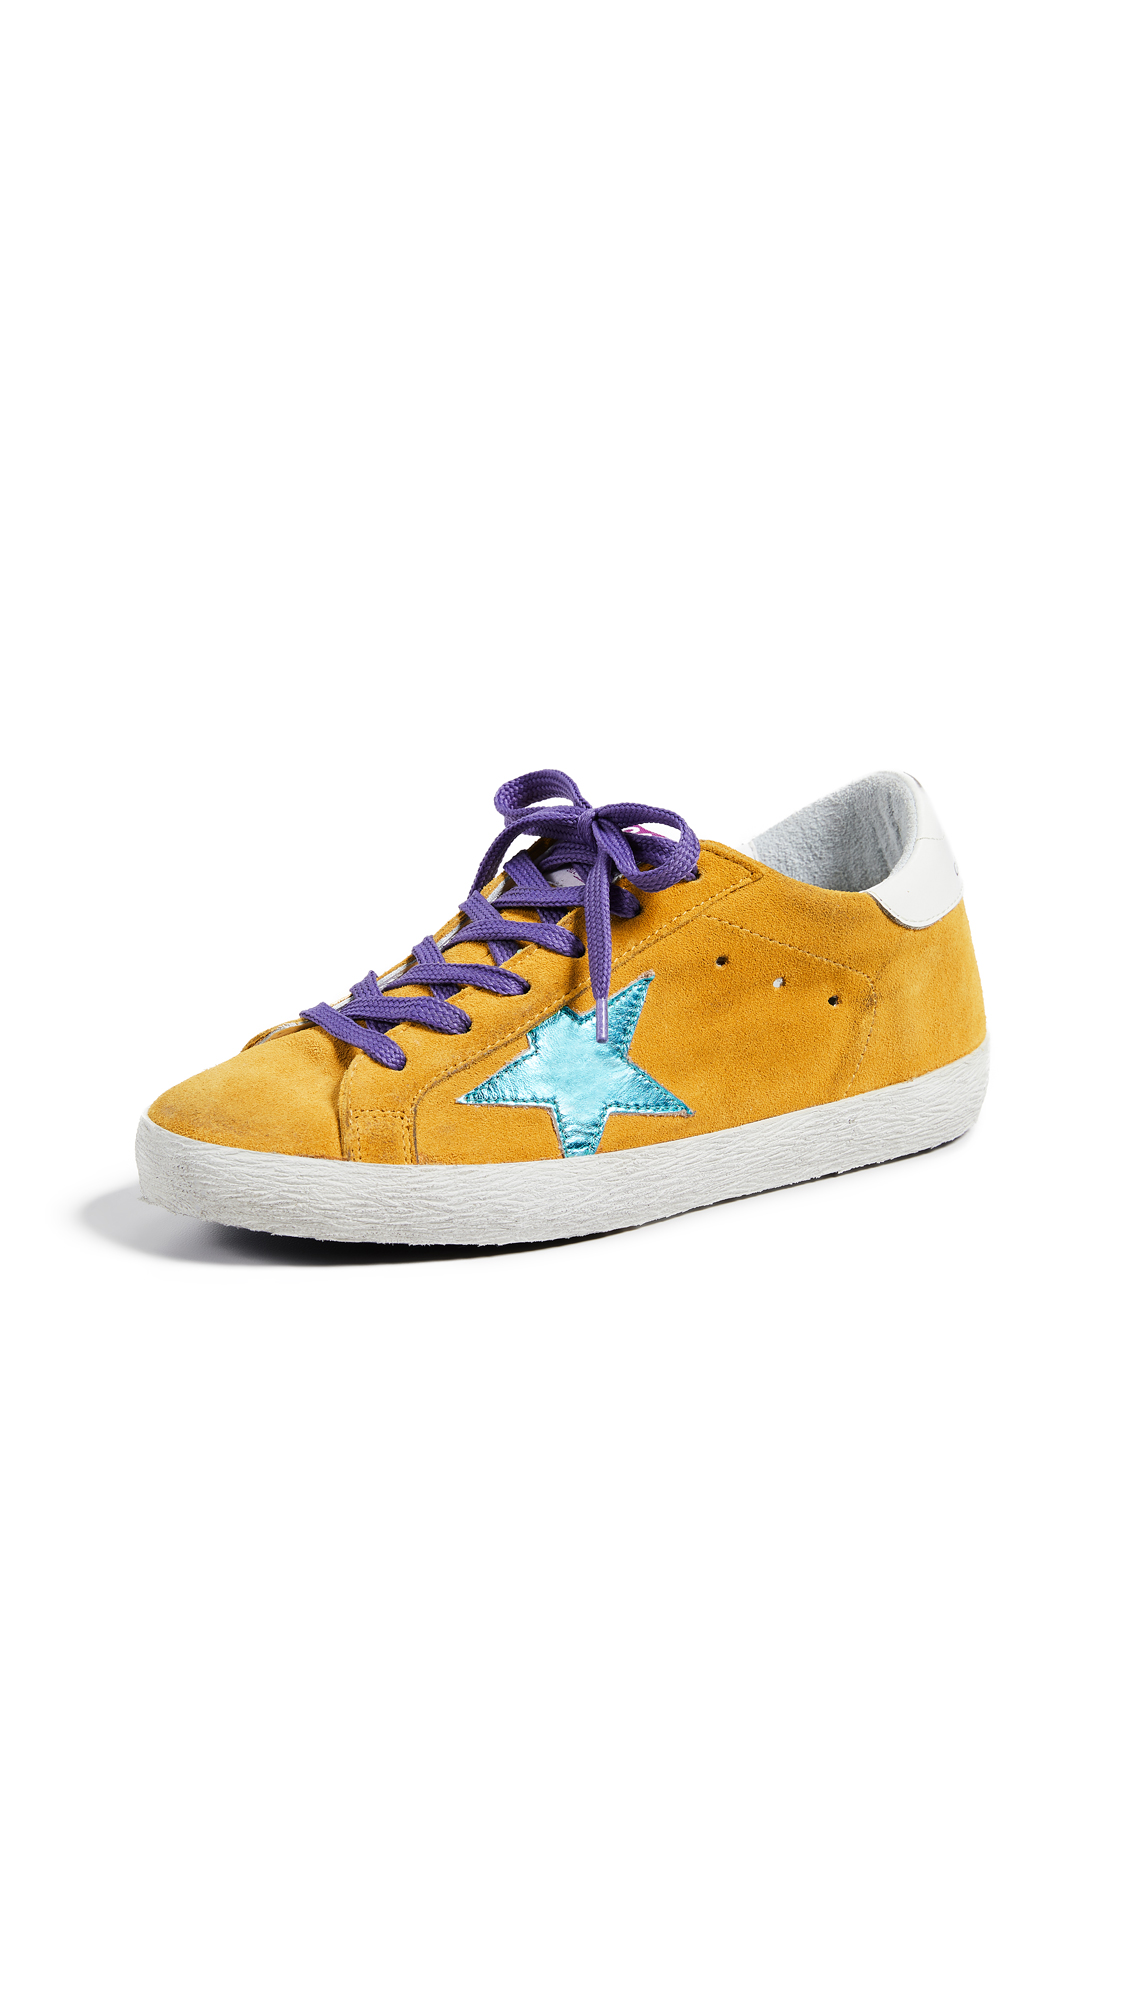 Golden Goose Superstar Sneakers - Sun/Acquamarine Star